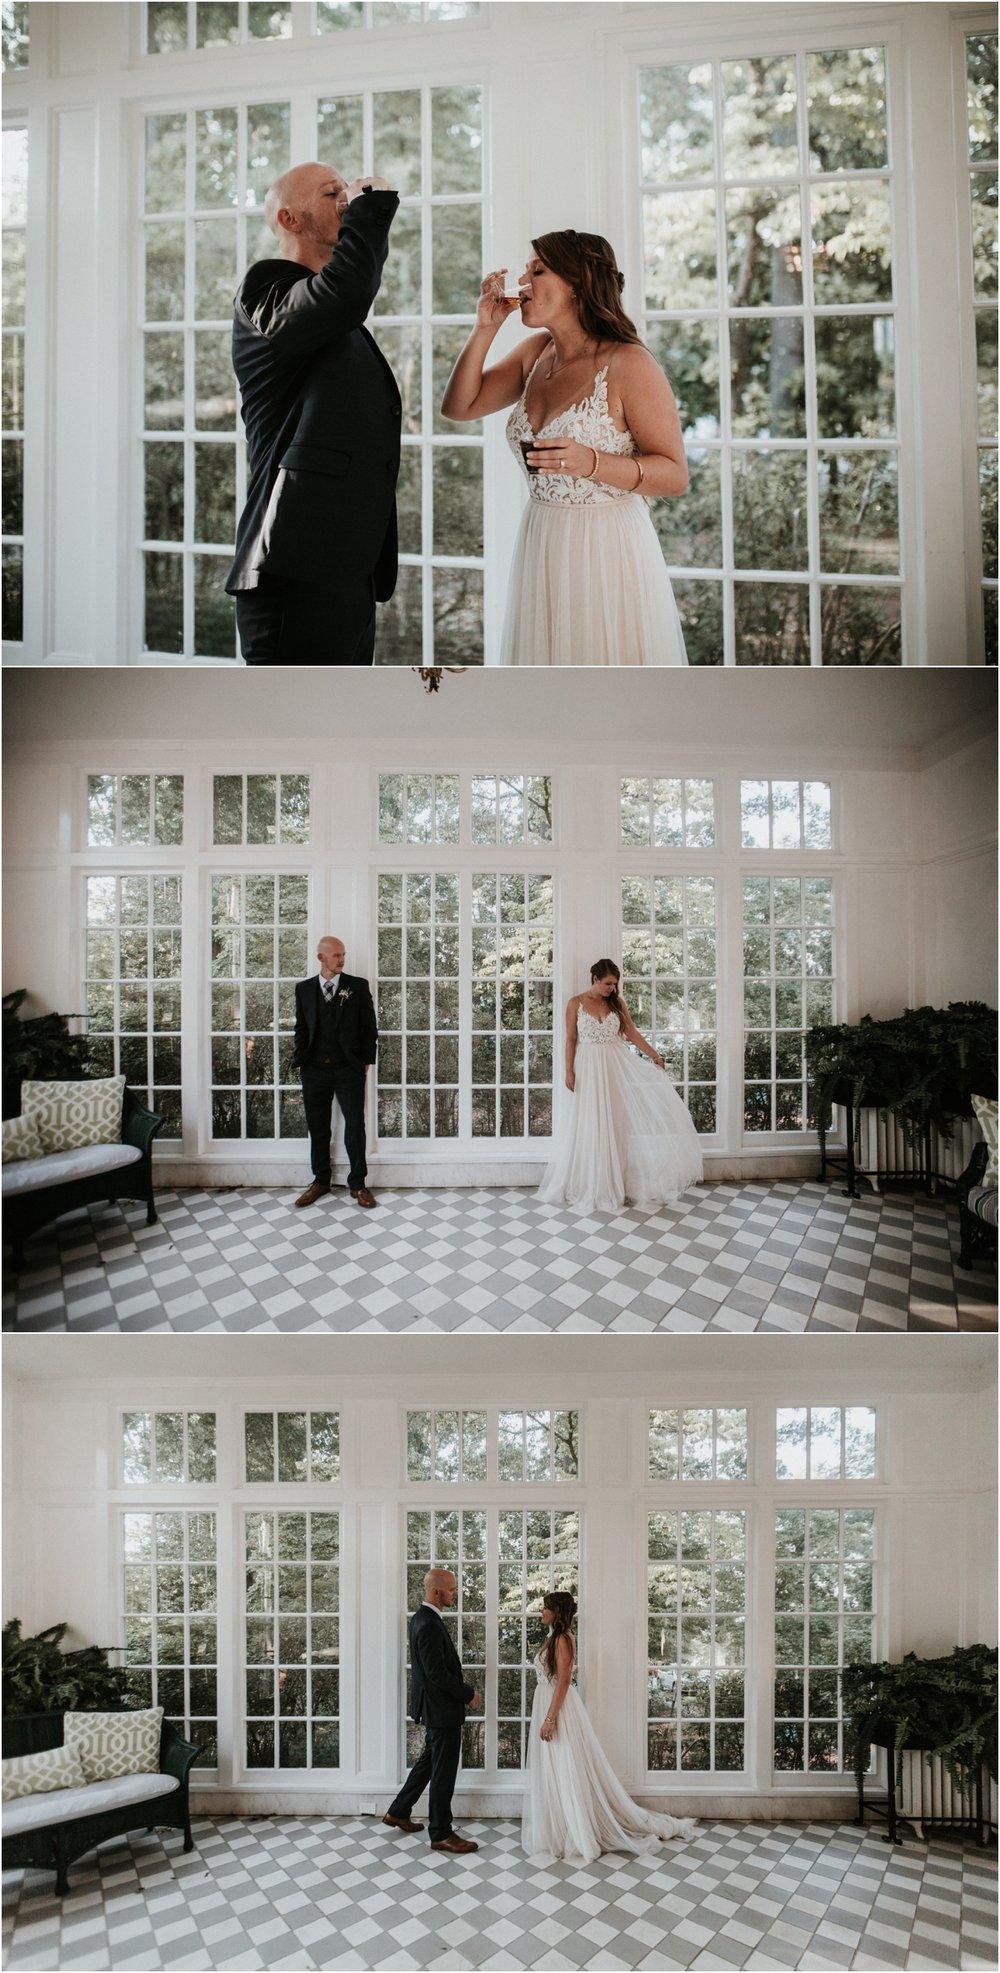 Stowe-manor-wedding-belmont-nc_0052.jpg